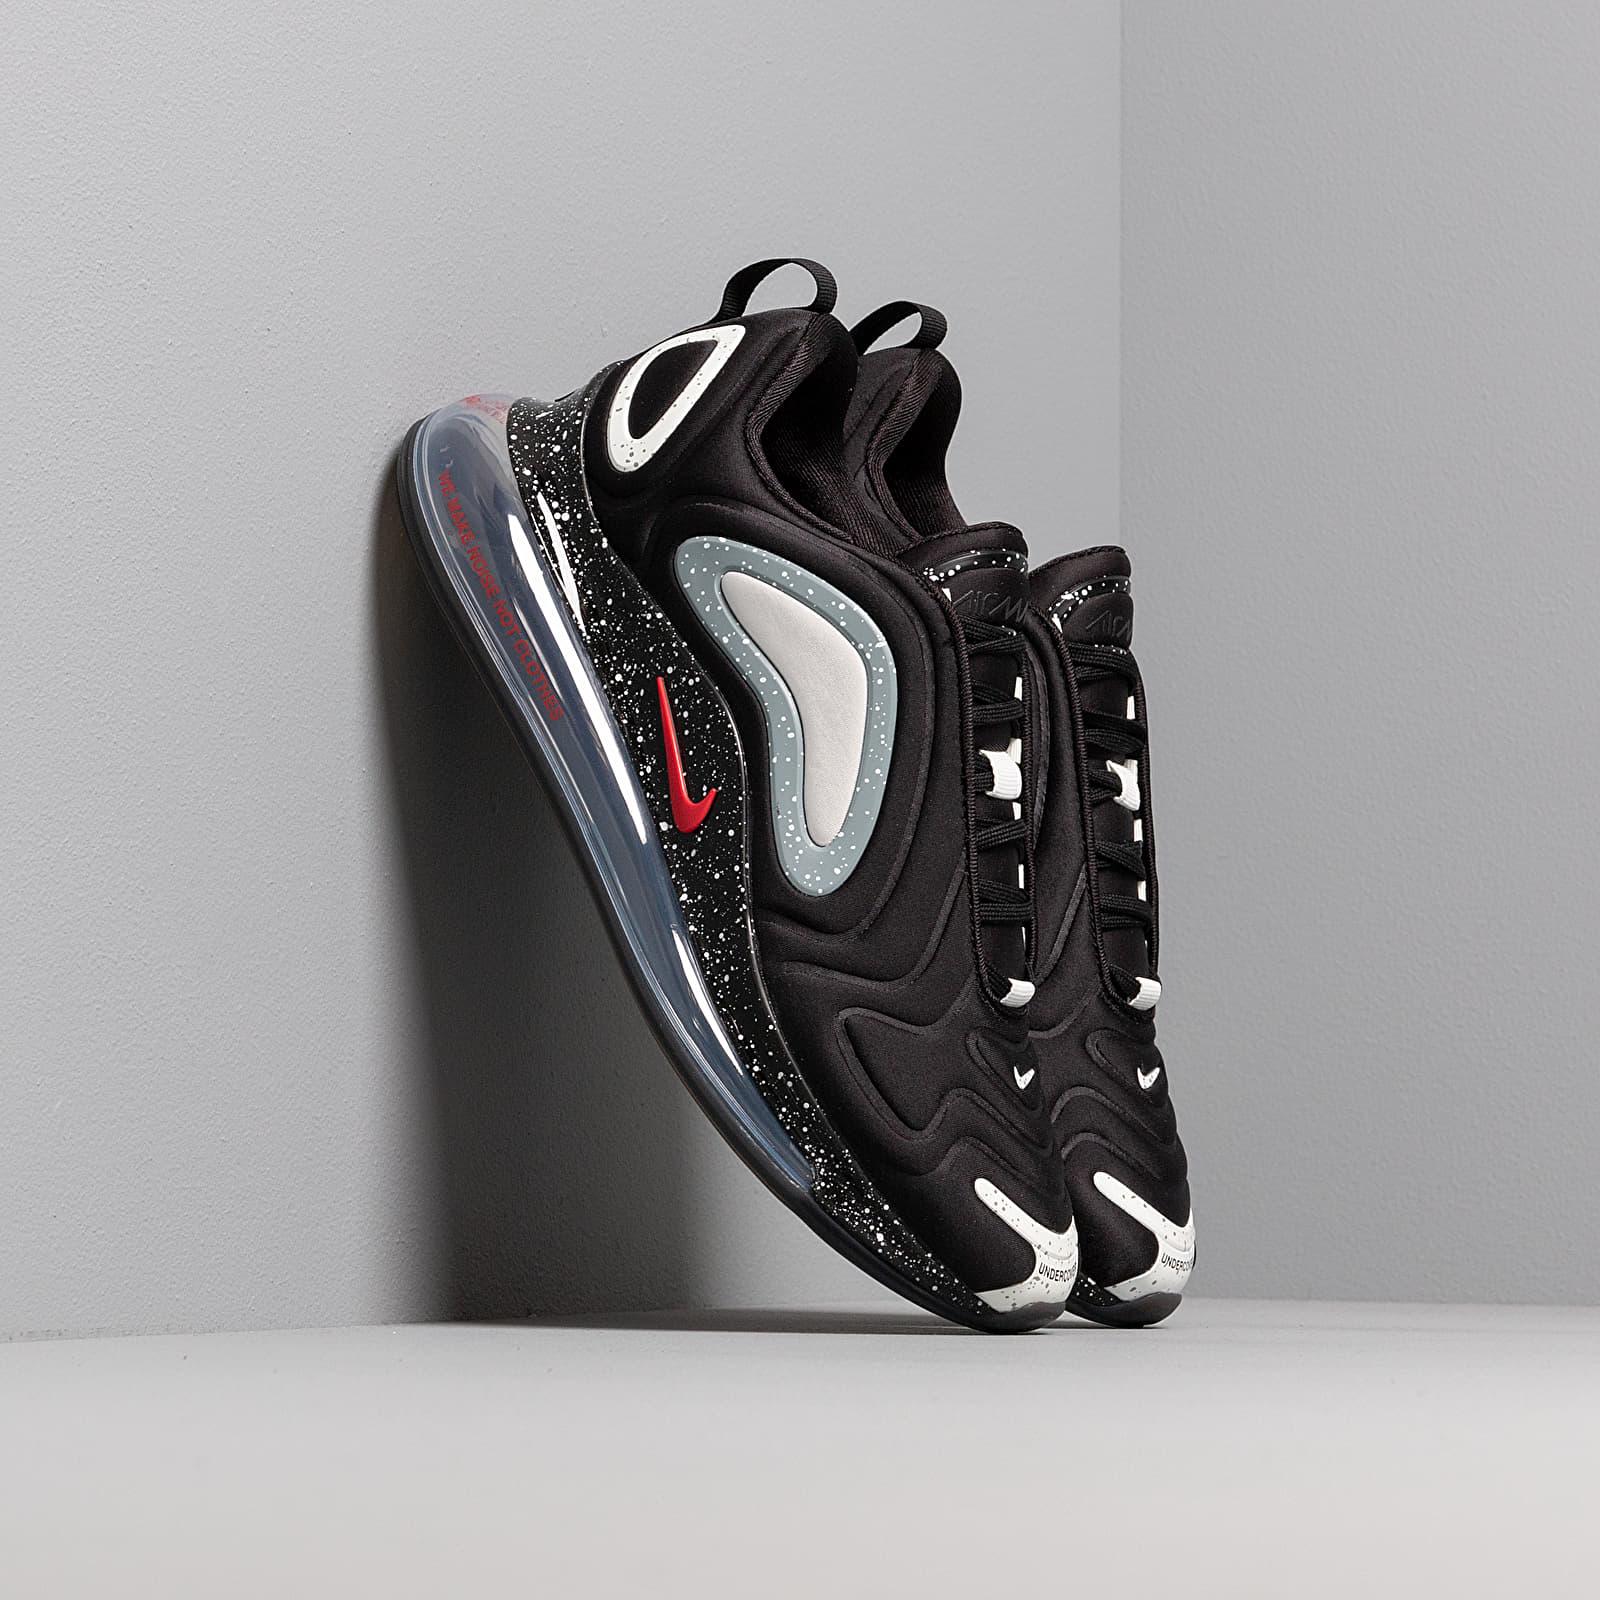 Nike x Undercover Air Max 720